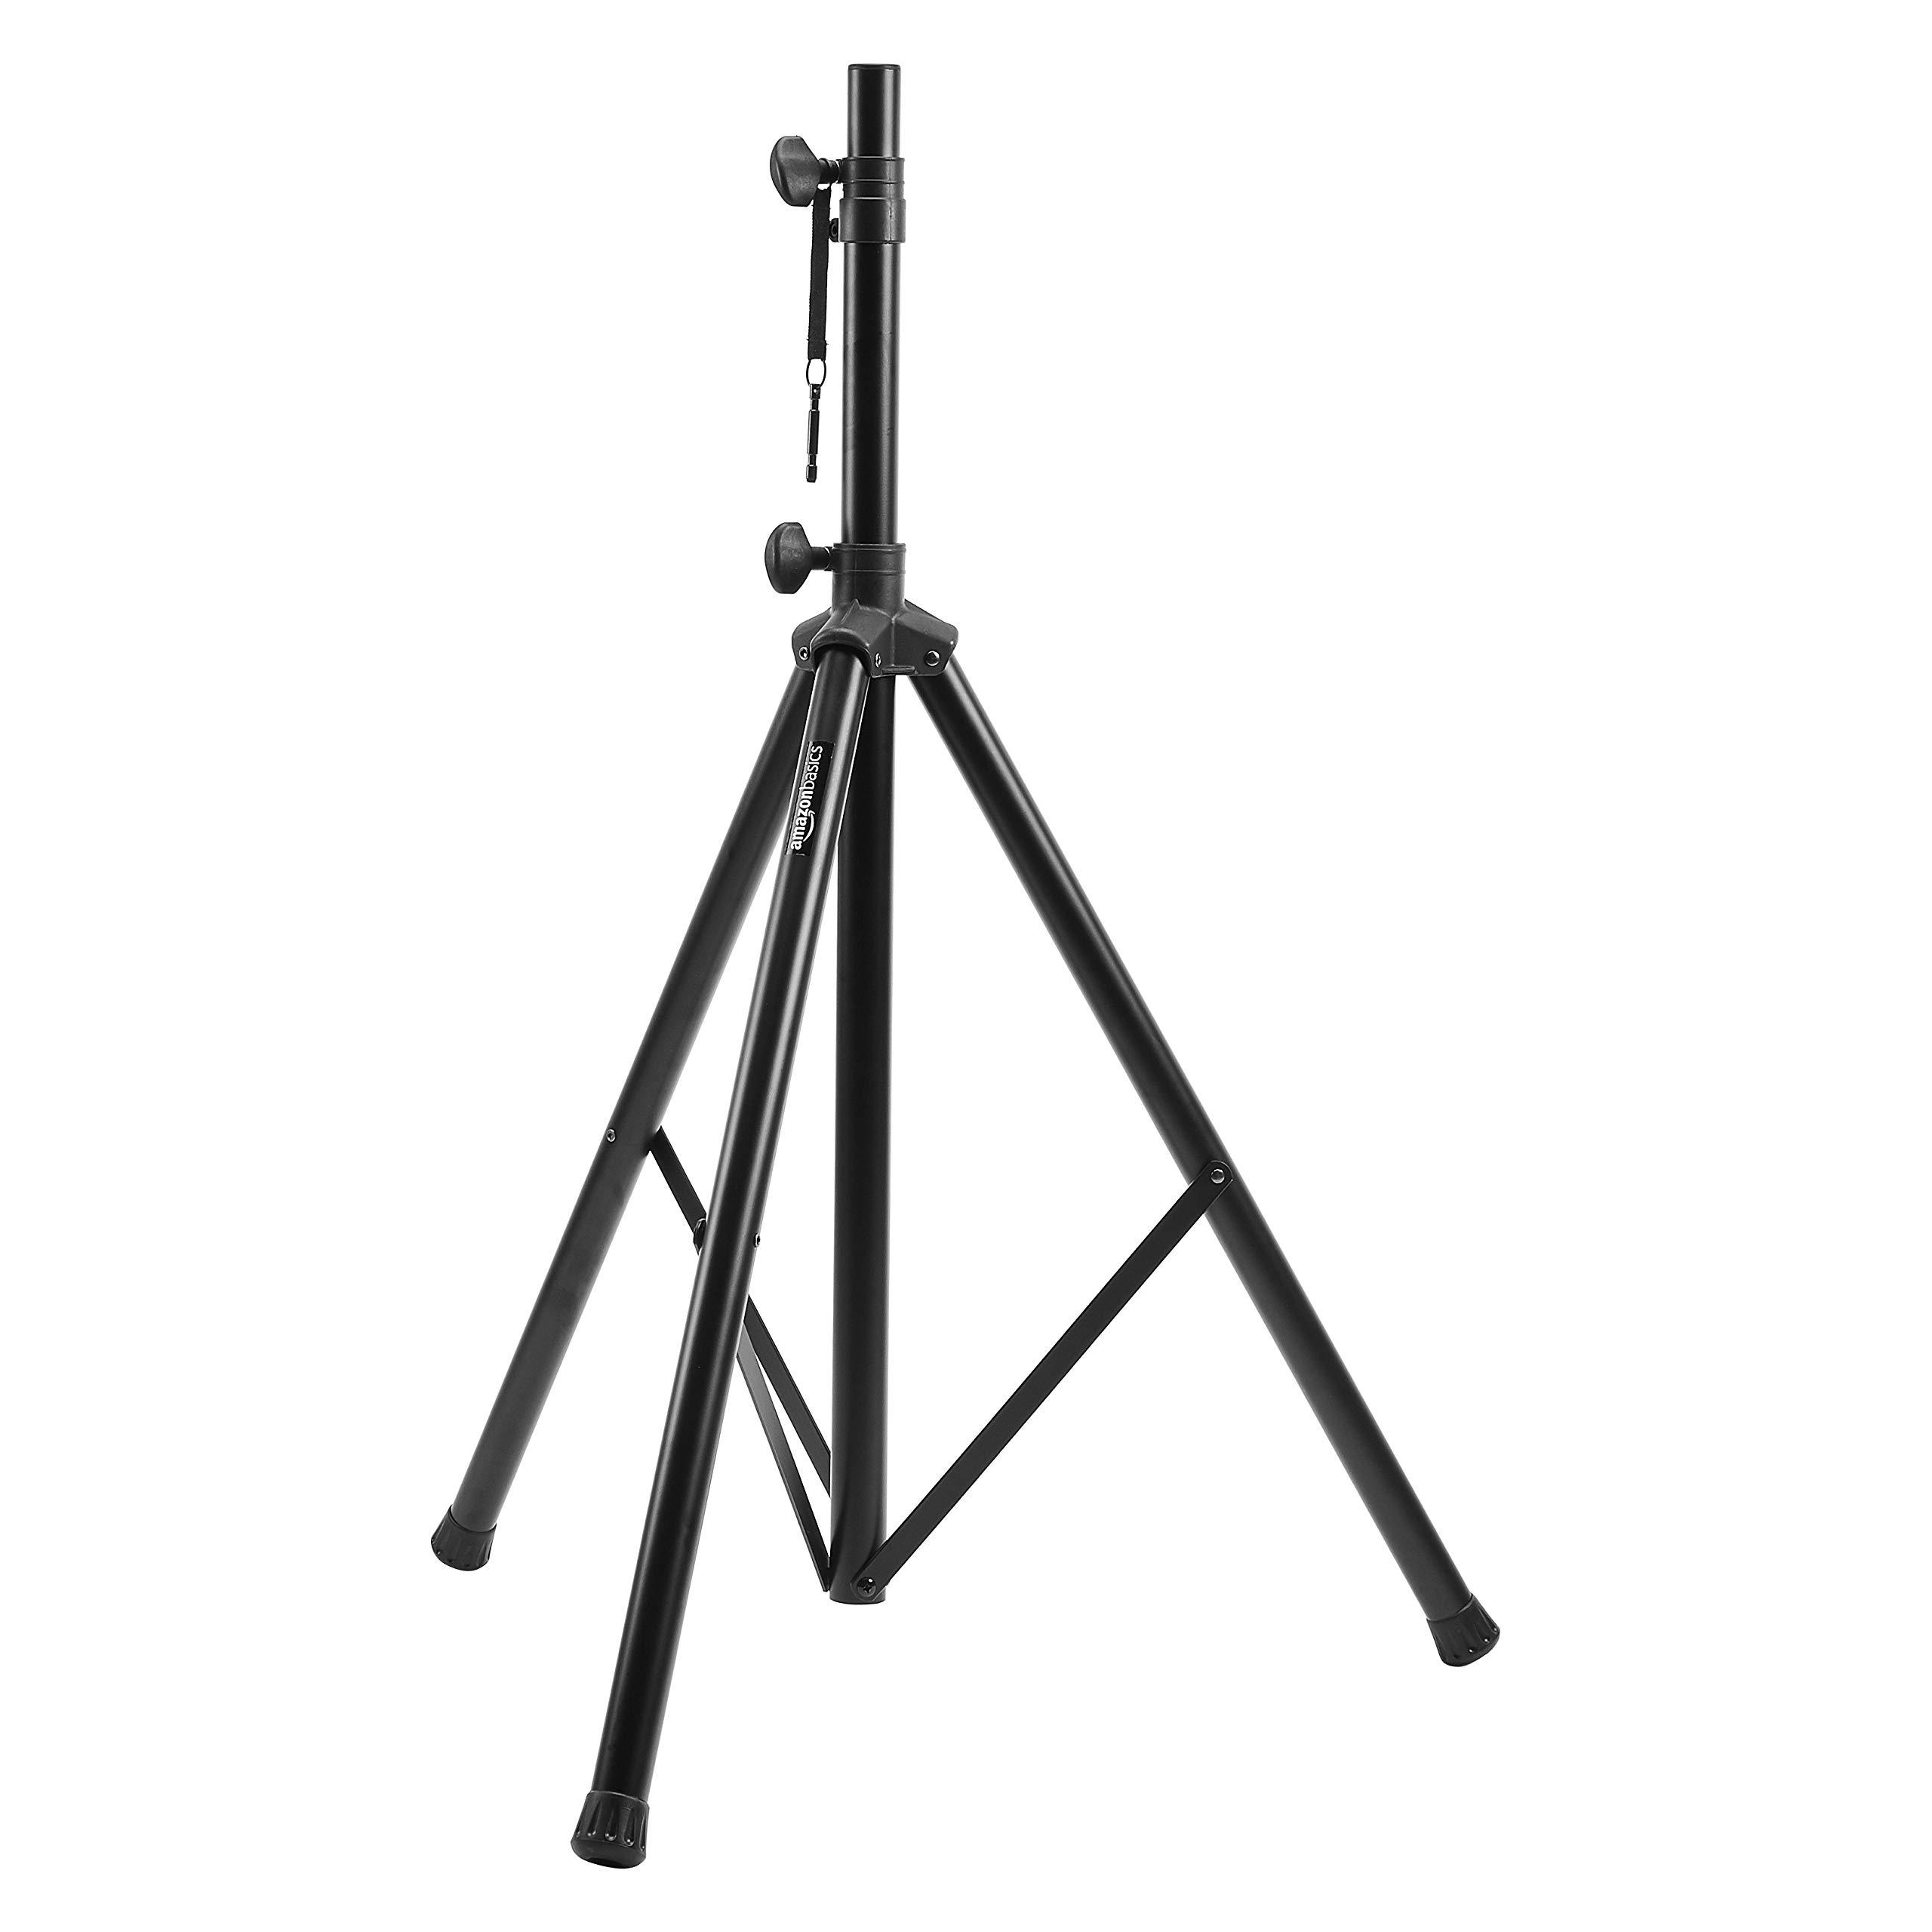 Amazon Basics Adjustable Speaker Stand - 4.1 to 6.6-Foot, Steel